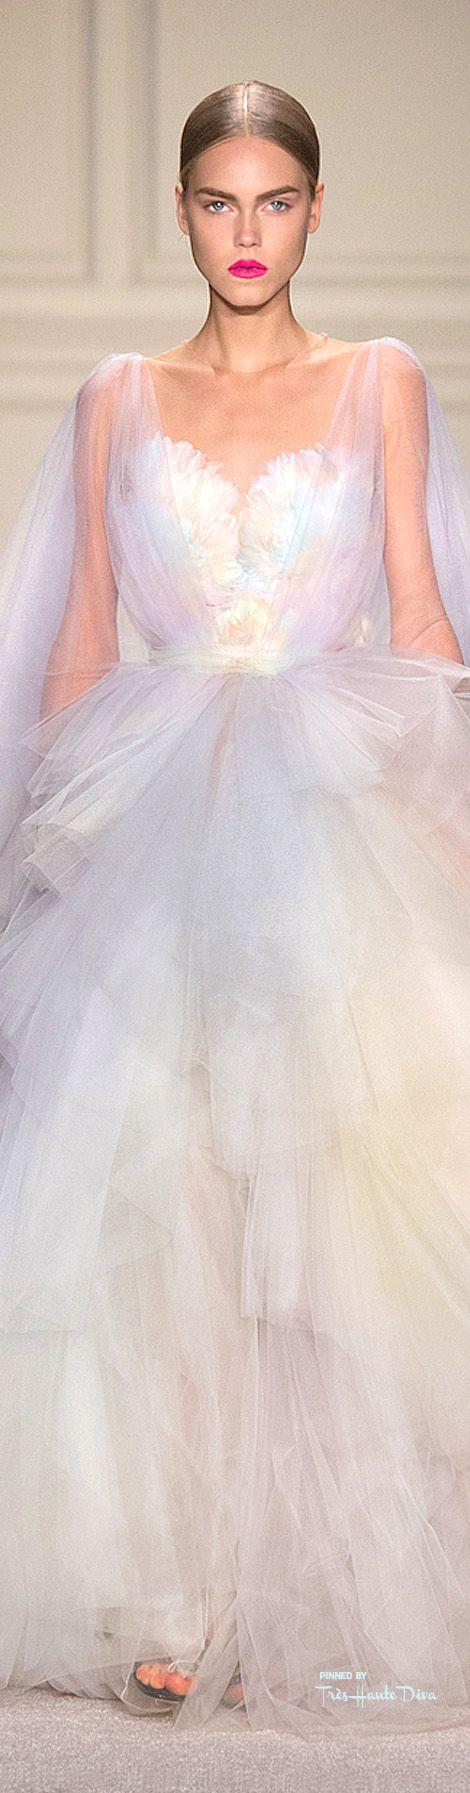 Marchesa Spring 2016 RTW ♔ Très Haute Diva ♔ For more fashion visit my website at  http://www.treshautediva.com/